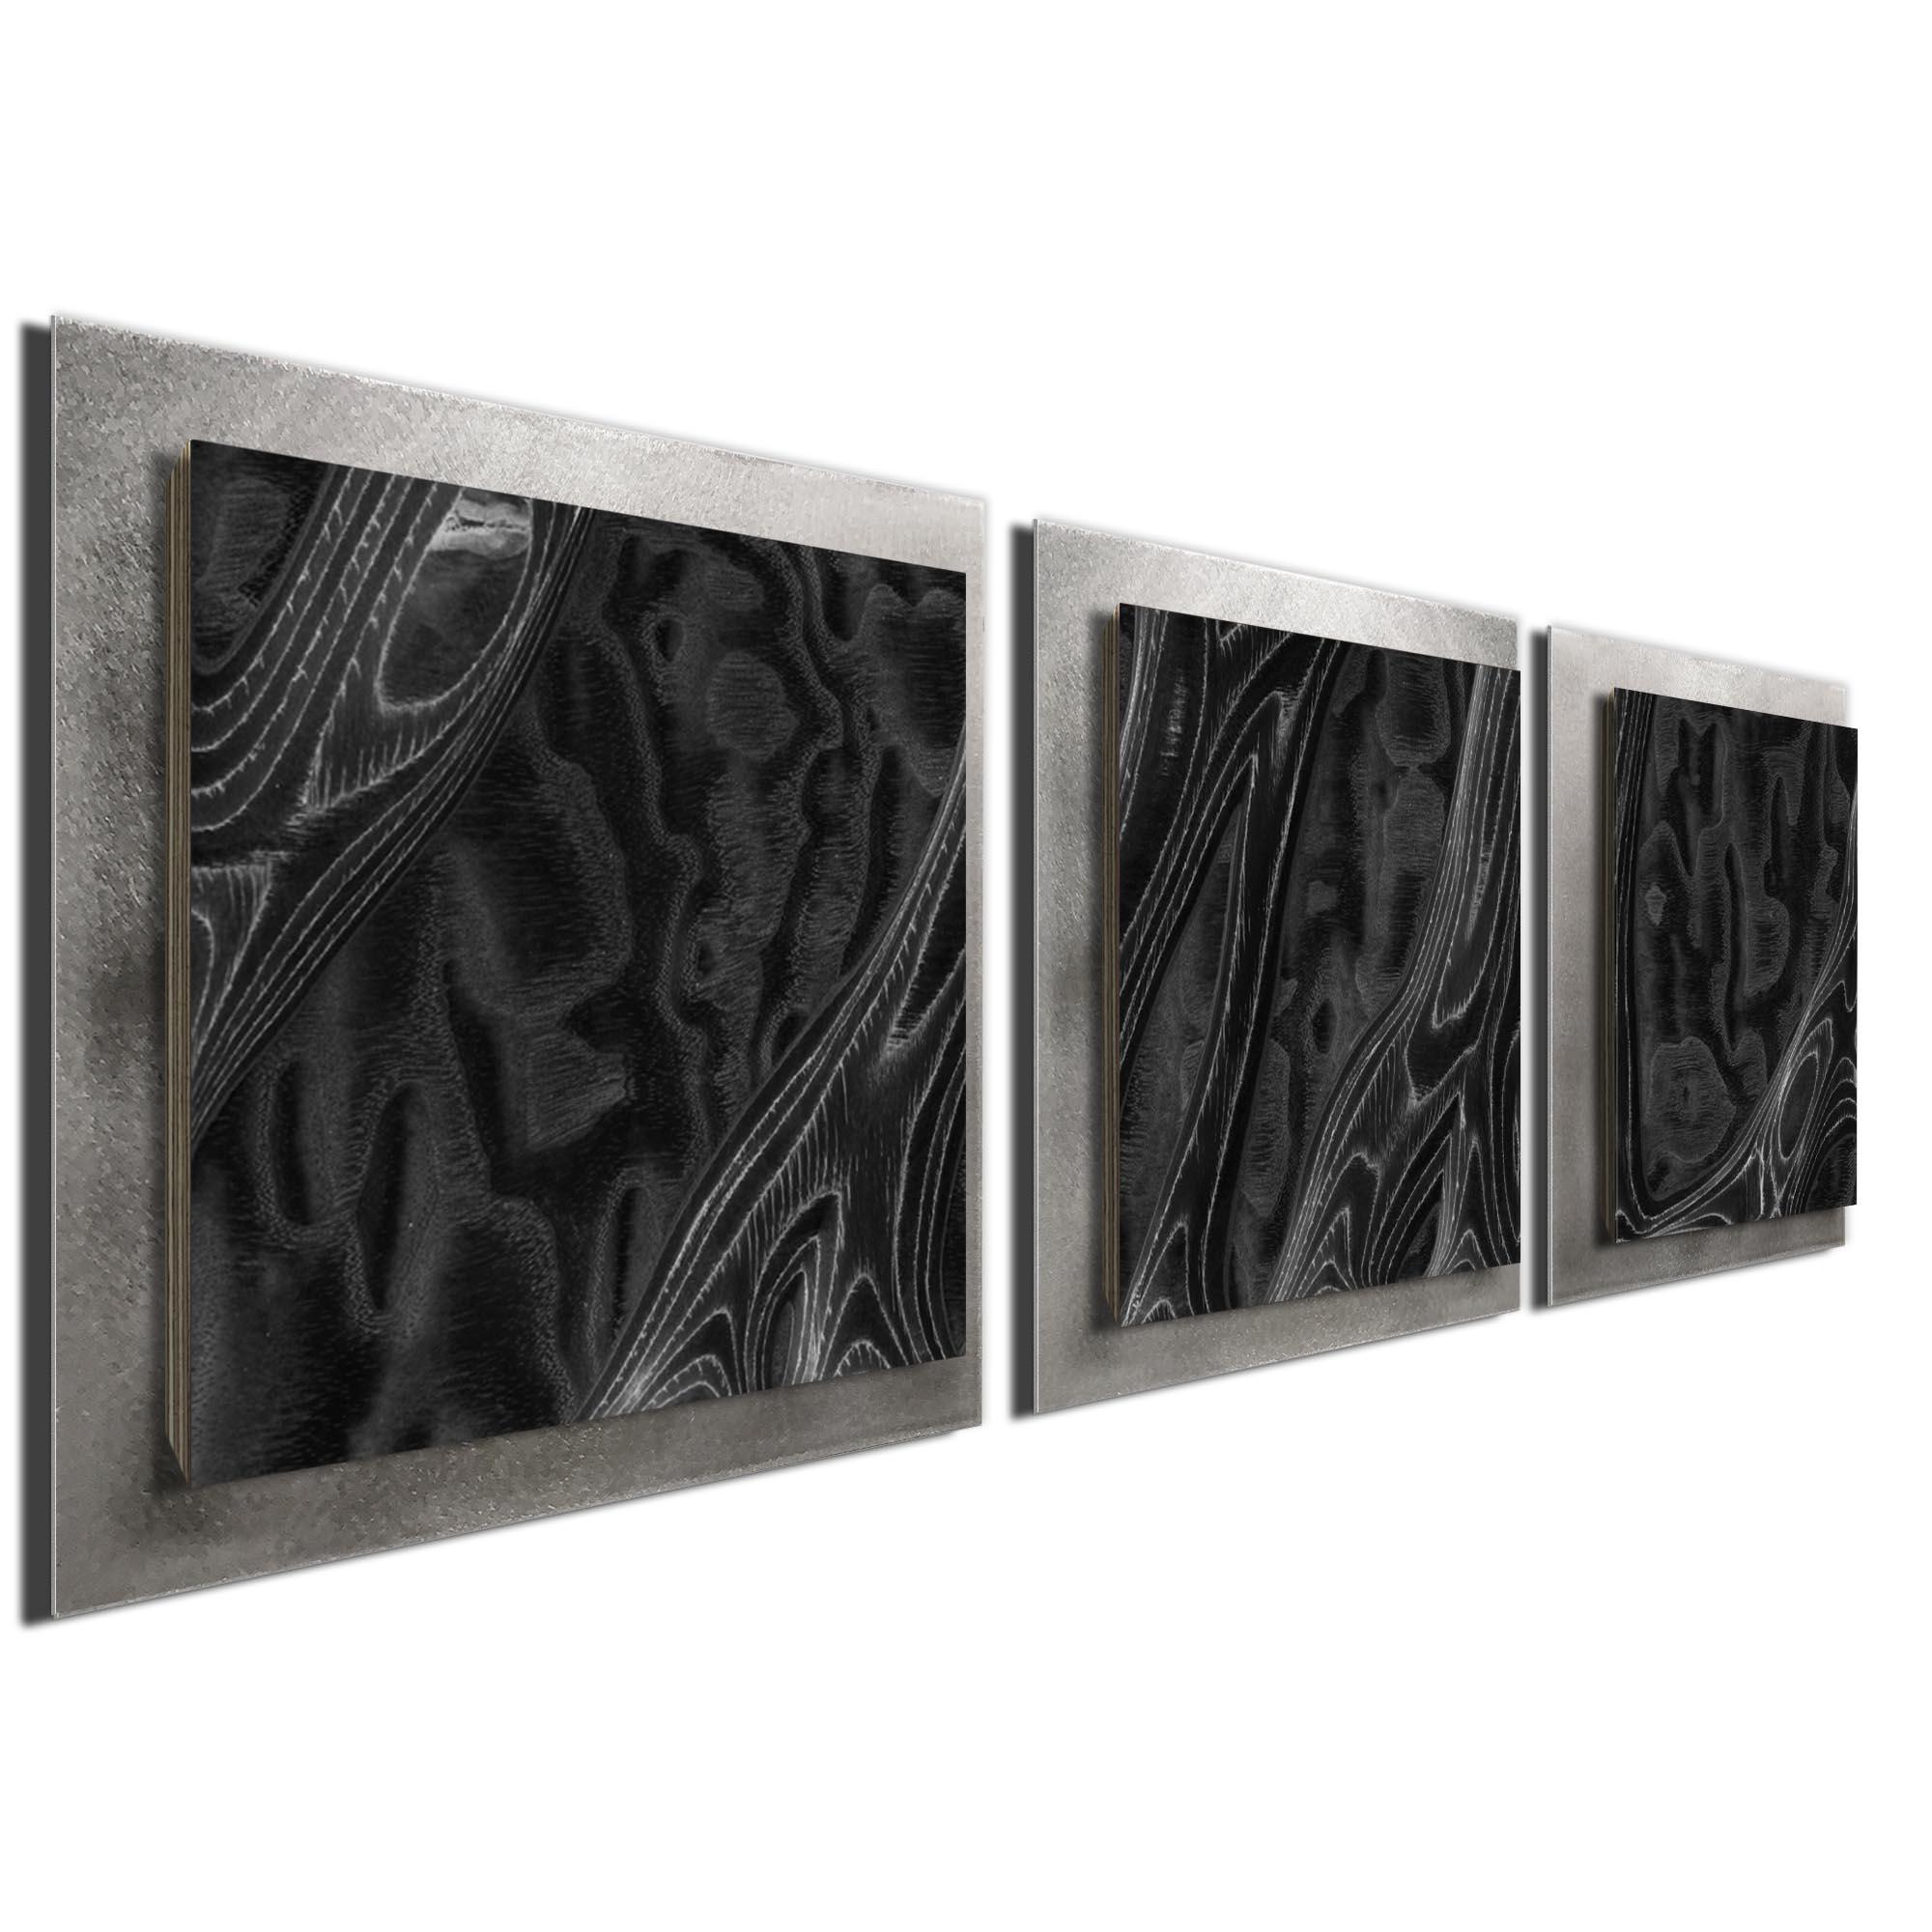 Ebony Burl Essence Silver by Jackson Wright Rustic Modern Style Wood Wall Art - Image 2